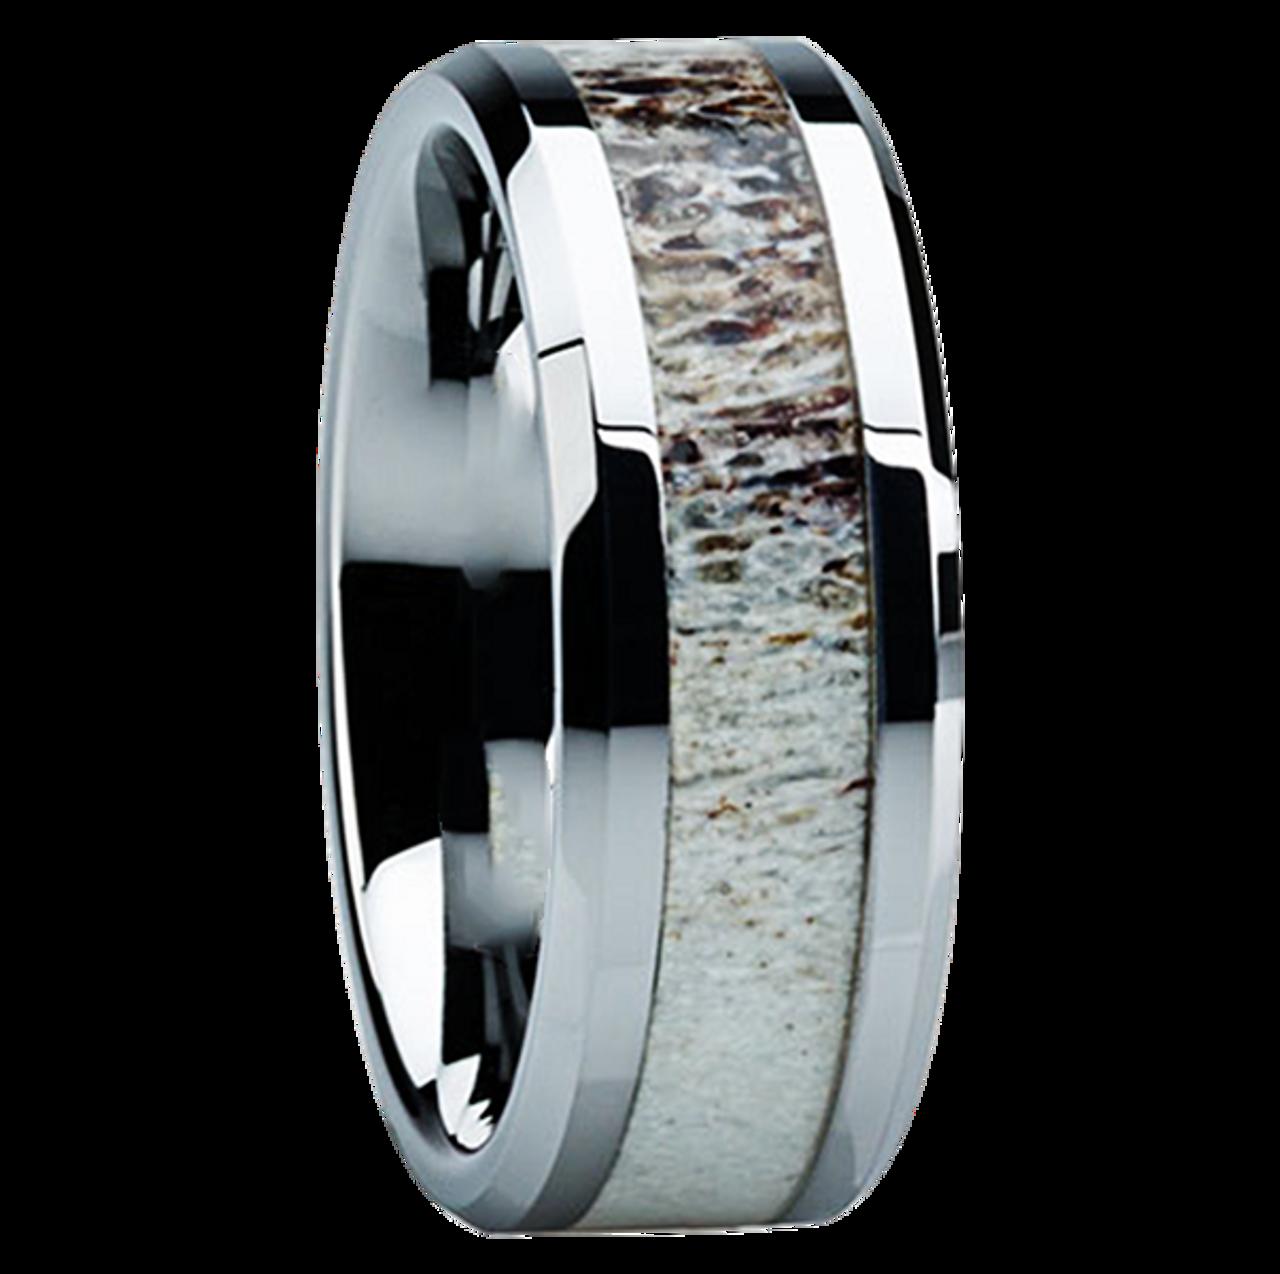 fca234647dfdd 8 mm Antler Mens Wedding Bands in Titanium - C121M